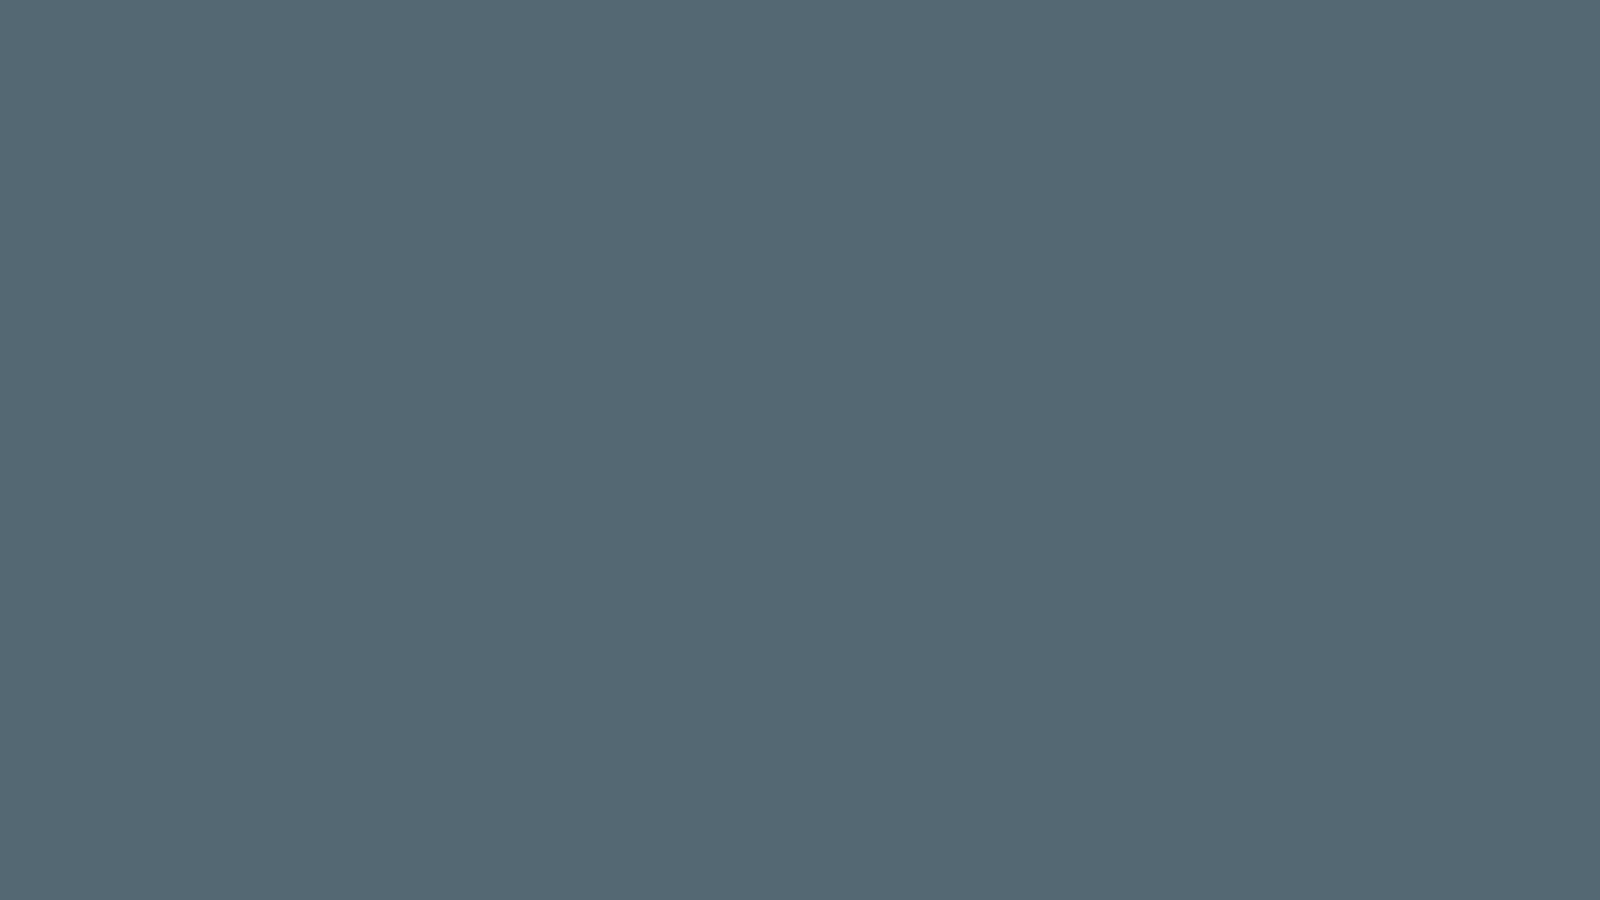 1600x900 Cadet Solid Color Background